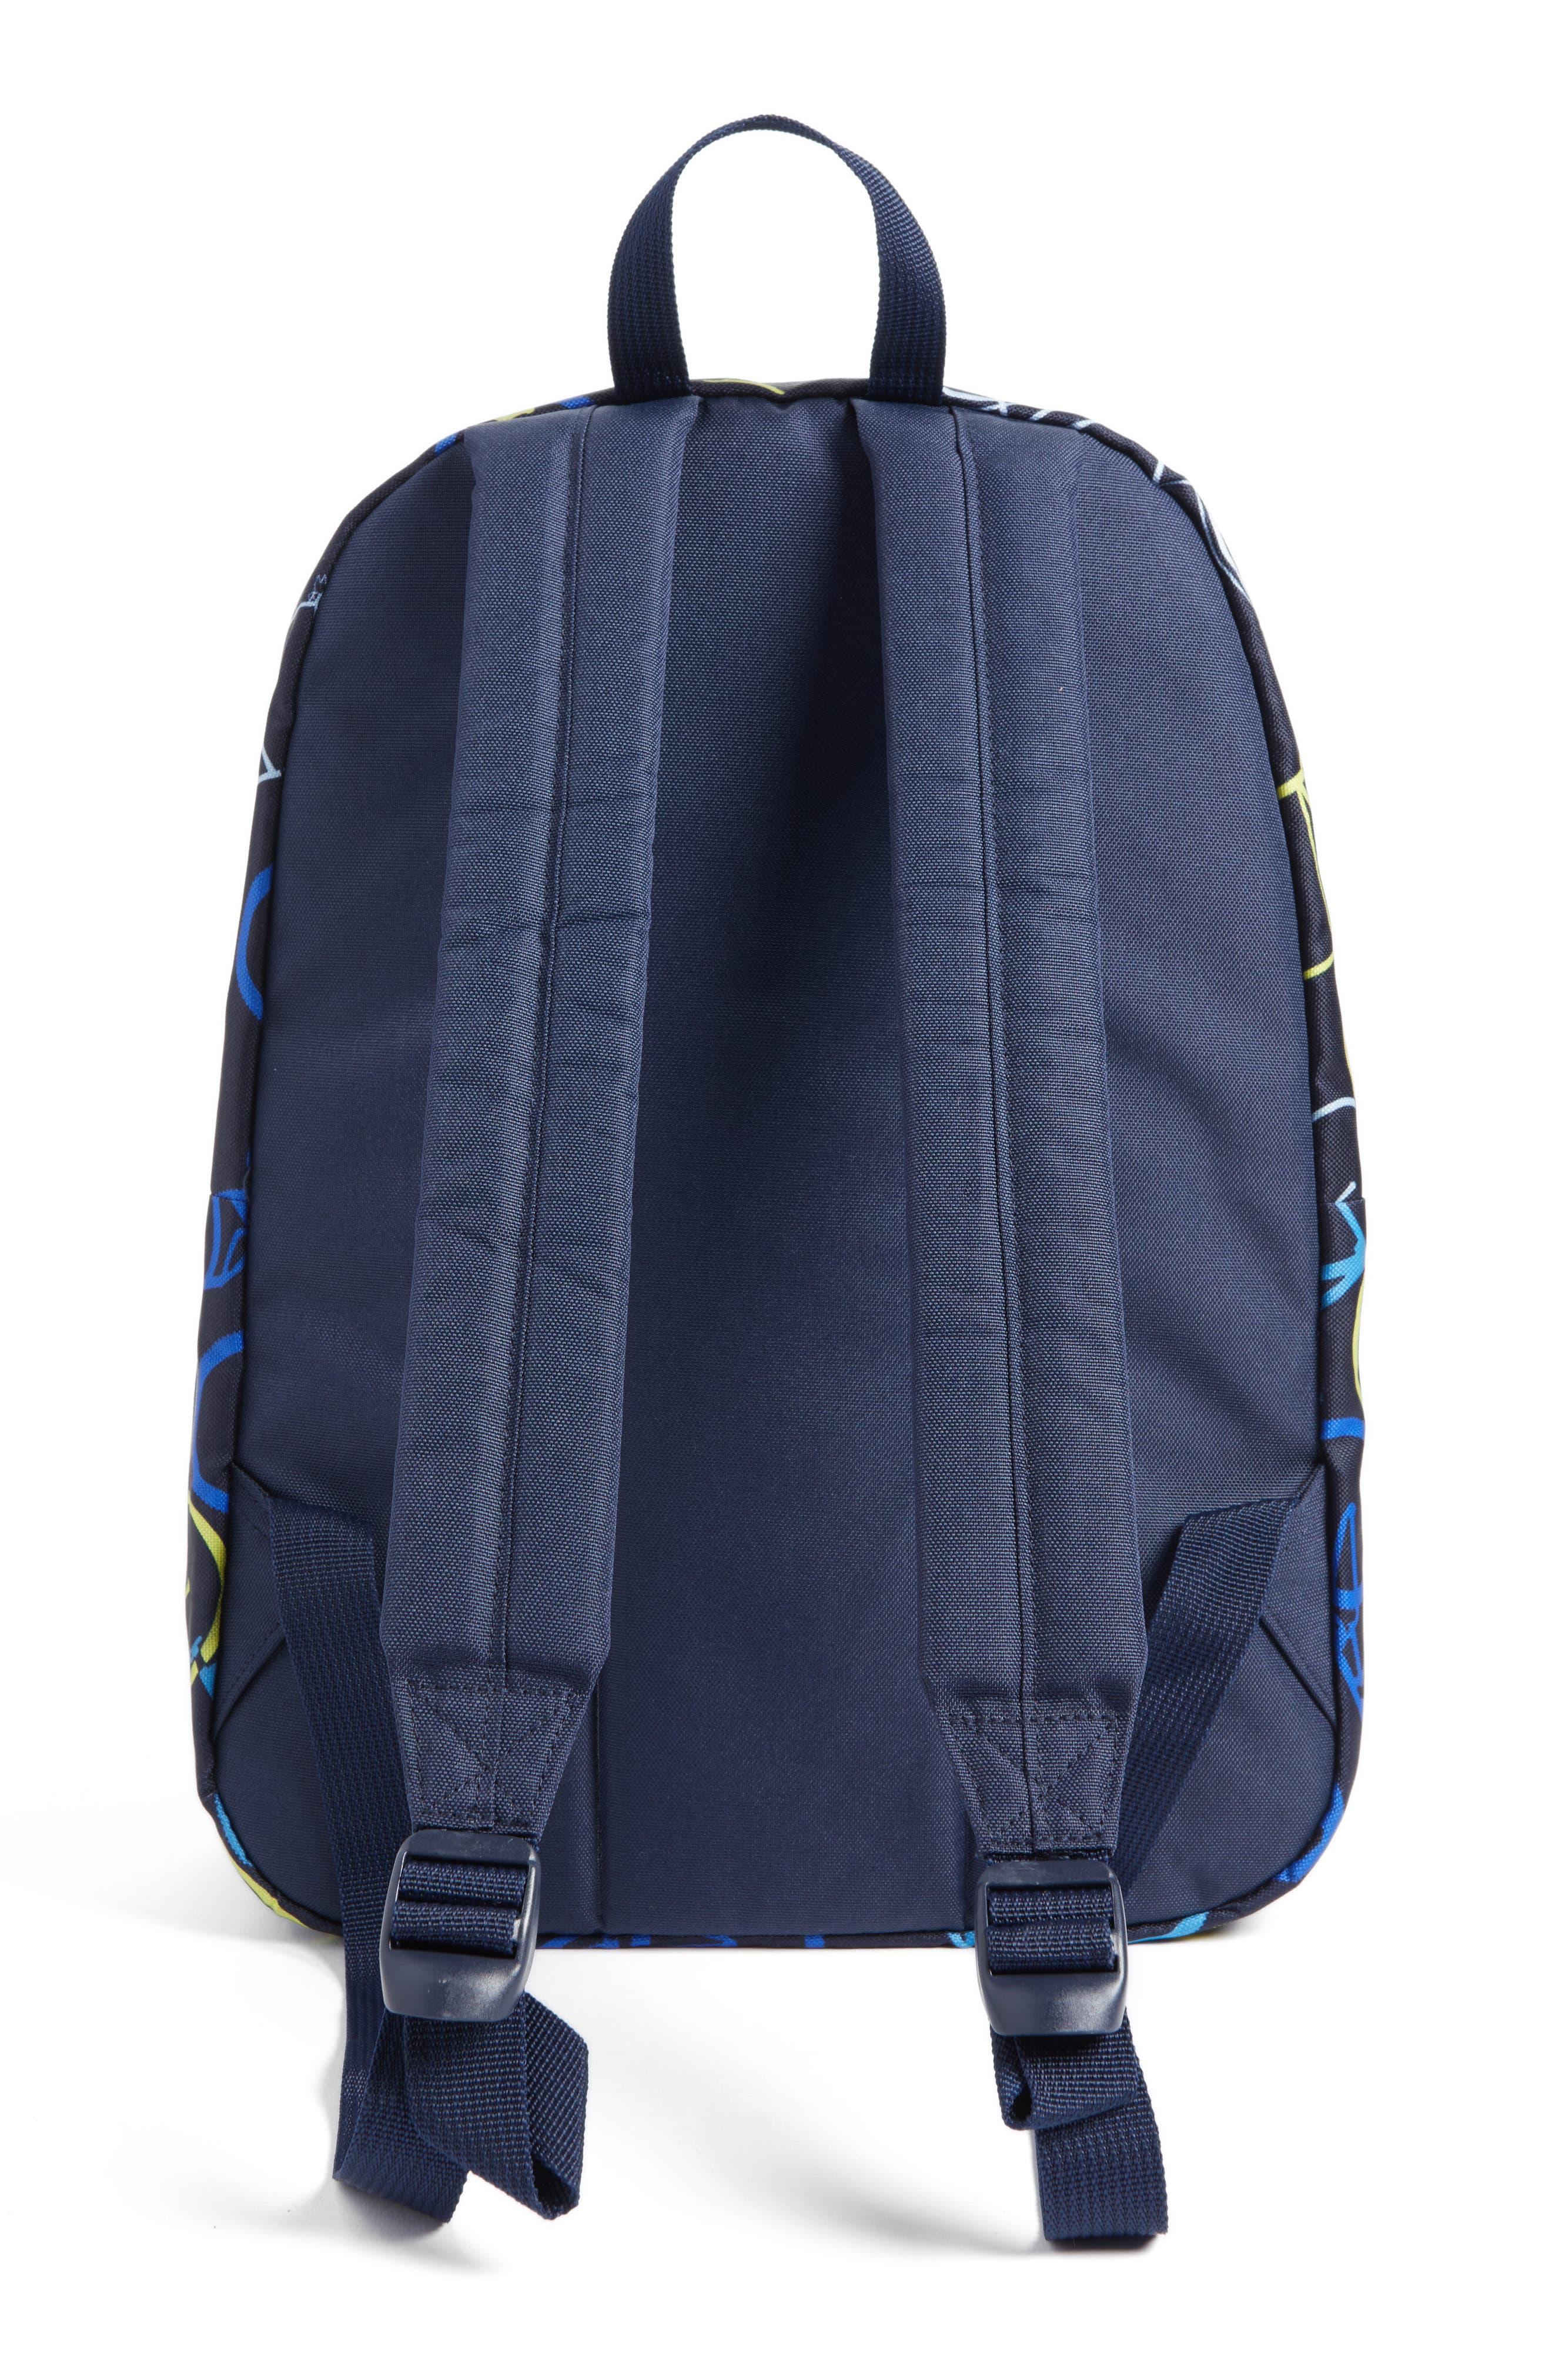 Flying Scot Backpack,                             Alternate thumbnail 2, color,                             411